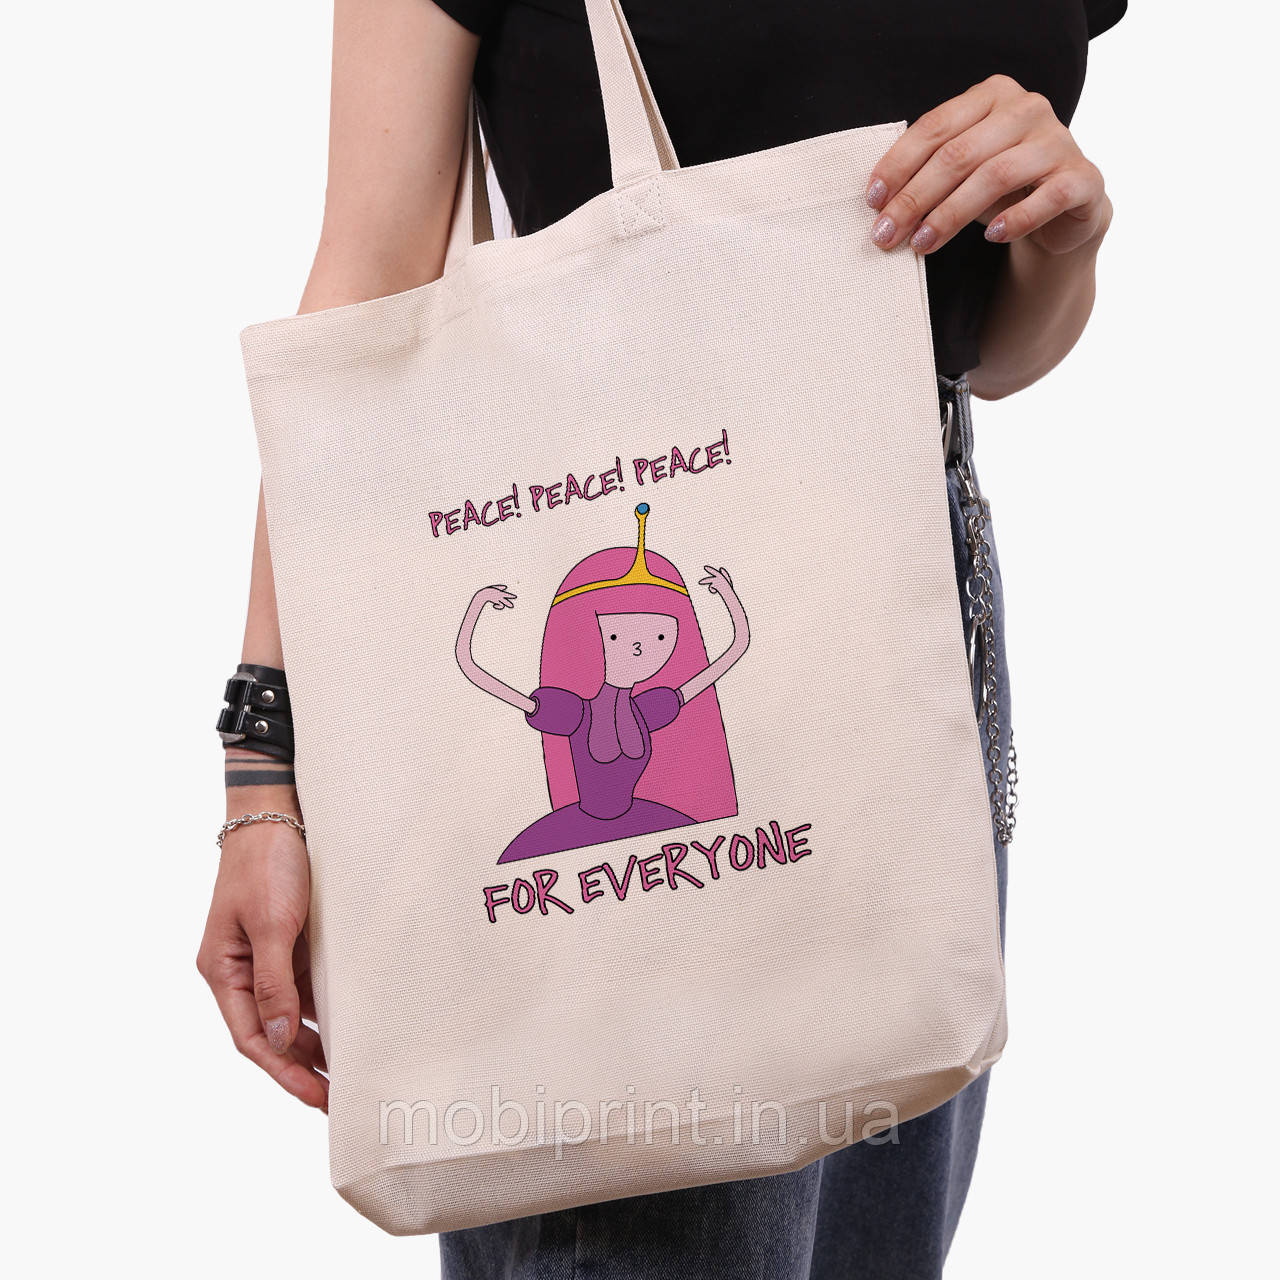 Эко сумка шоппер белая Принцесса бубльгум (Adventure Time) (9227-1576-1)  экосумка шопер 41*39*8 см